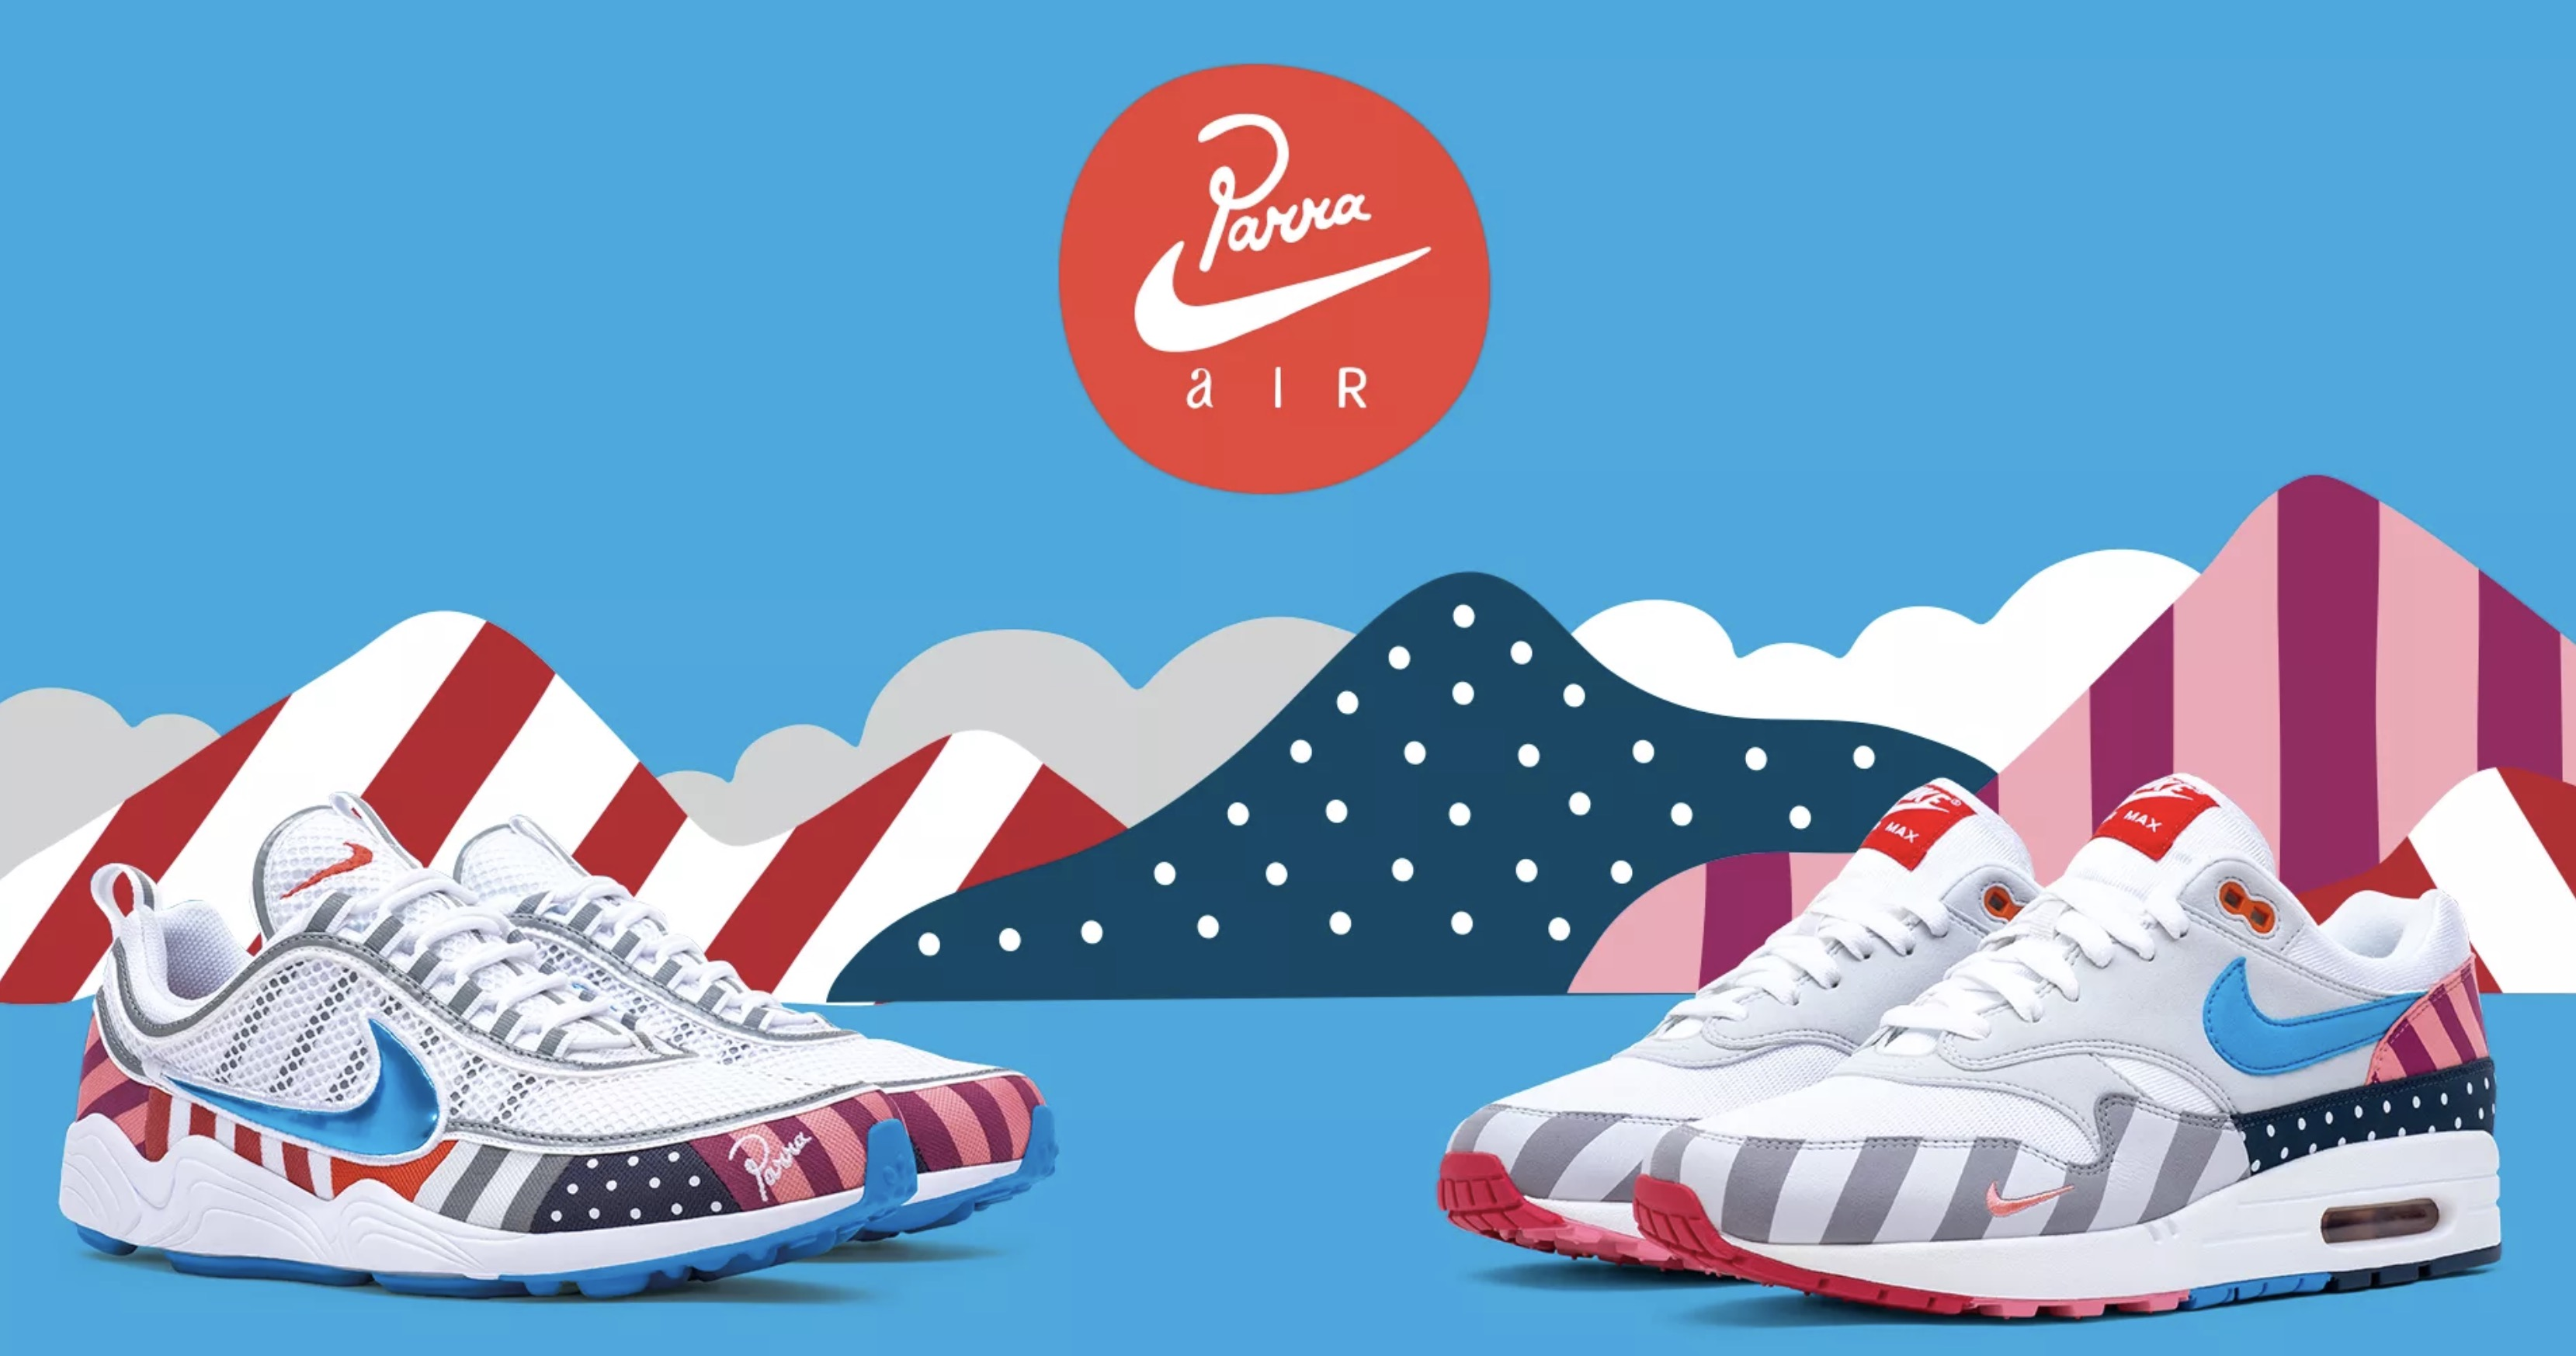 5c9ecf6813 Parra x Nike Air Max 1/Spiridon Raffle Guide | Upcoming Sneaker ...